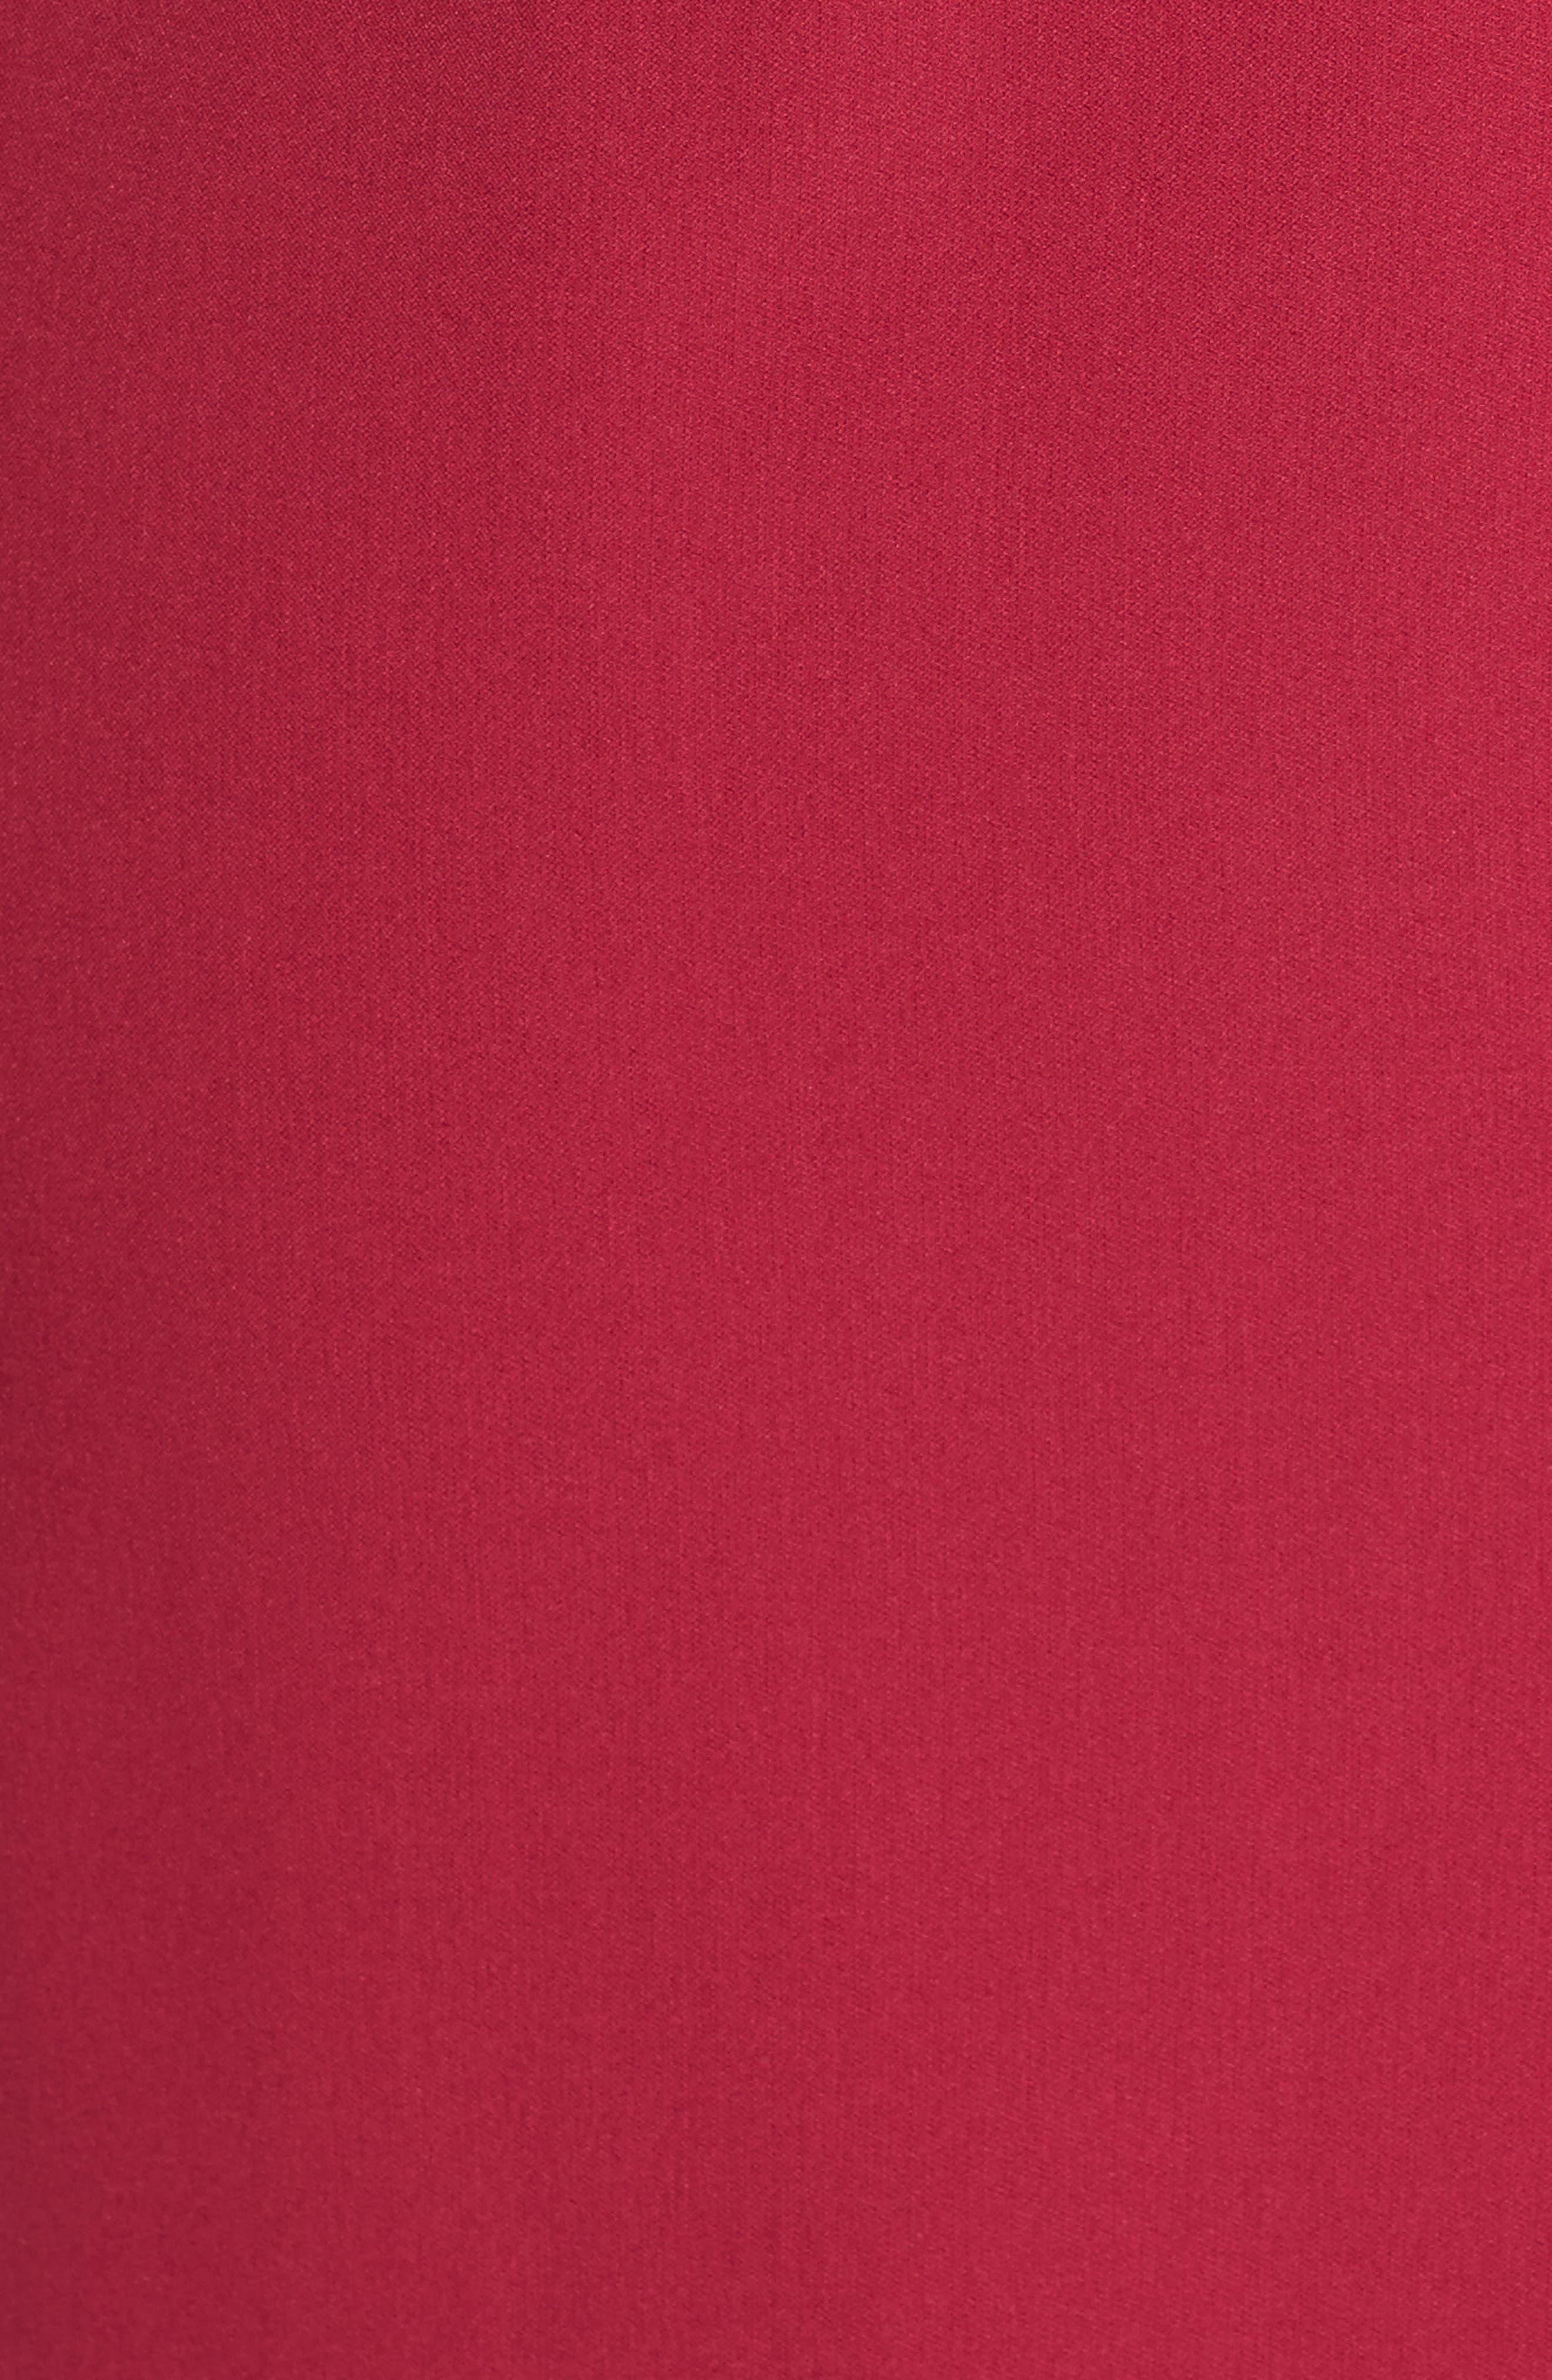 Stretch Crepe V-Neck Sheath,                             Alternate thumbnail 5, color,                             Geranium